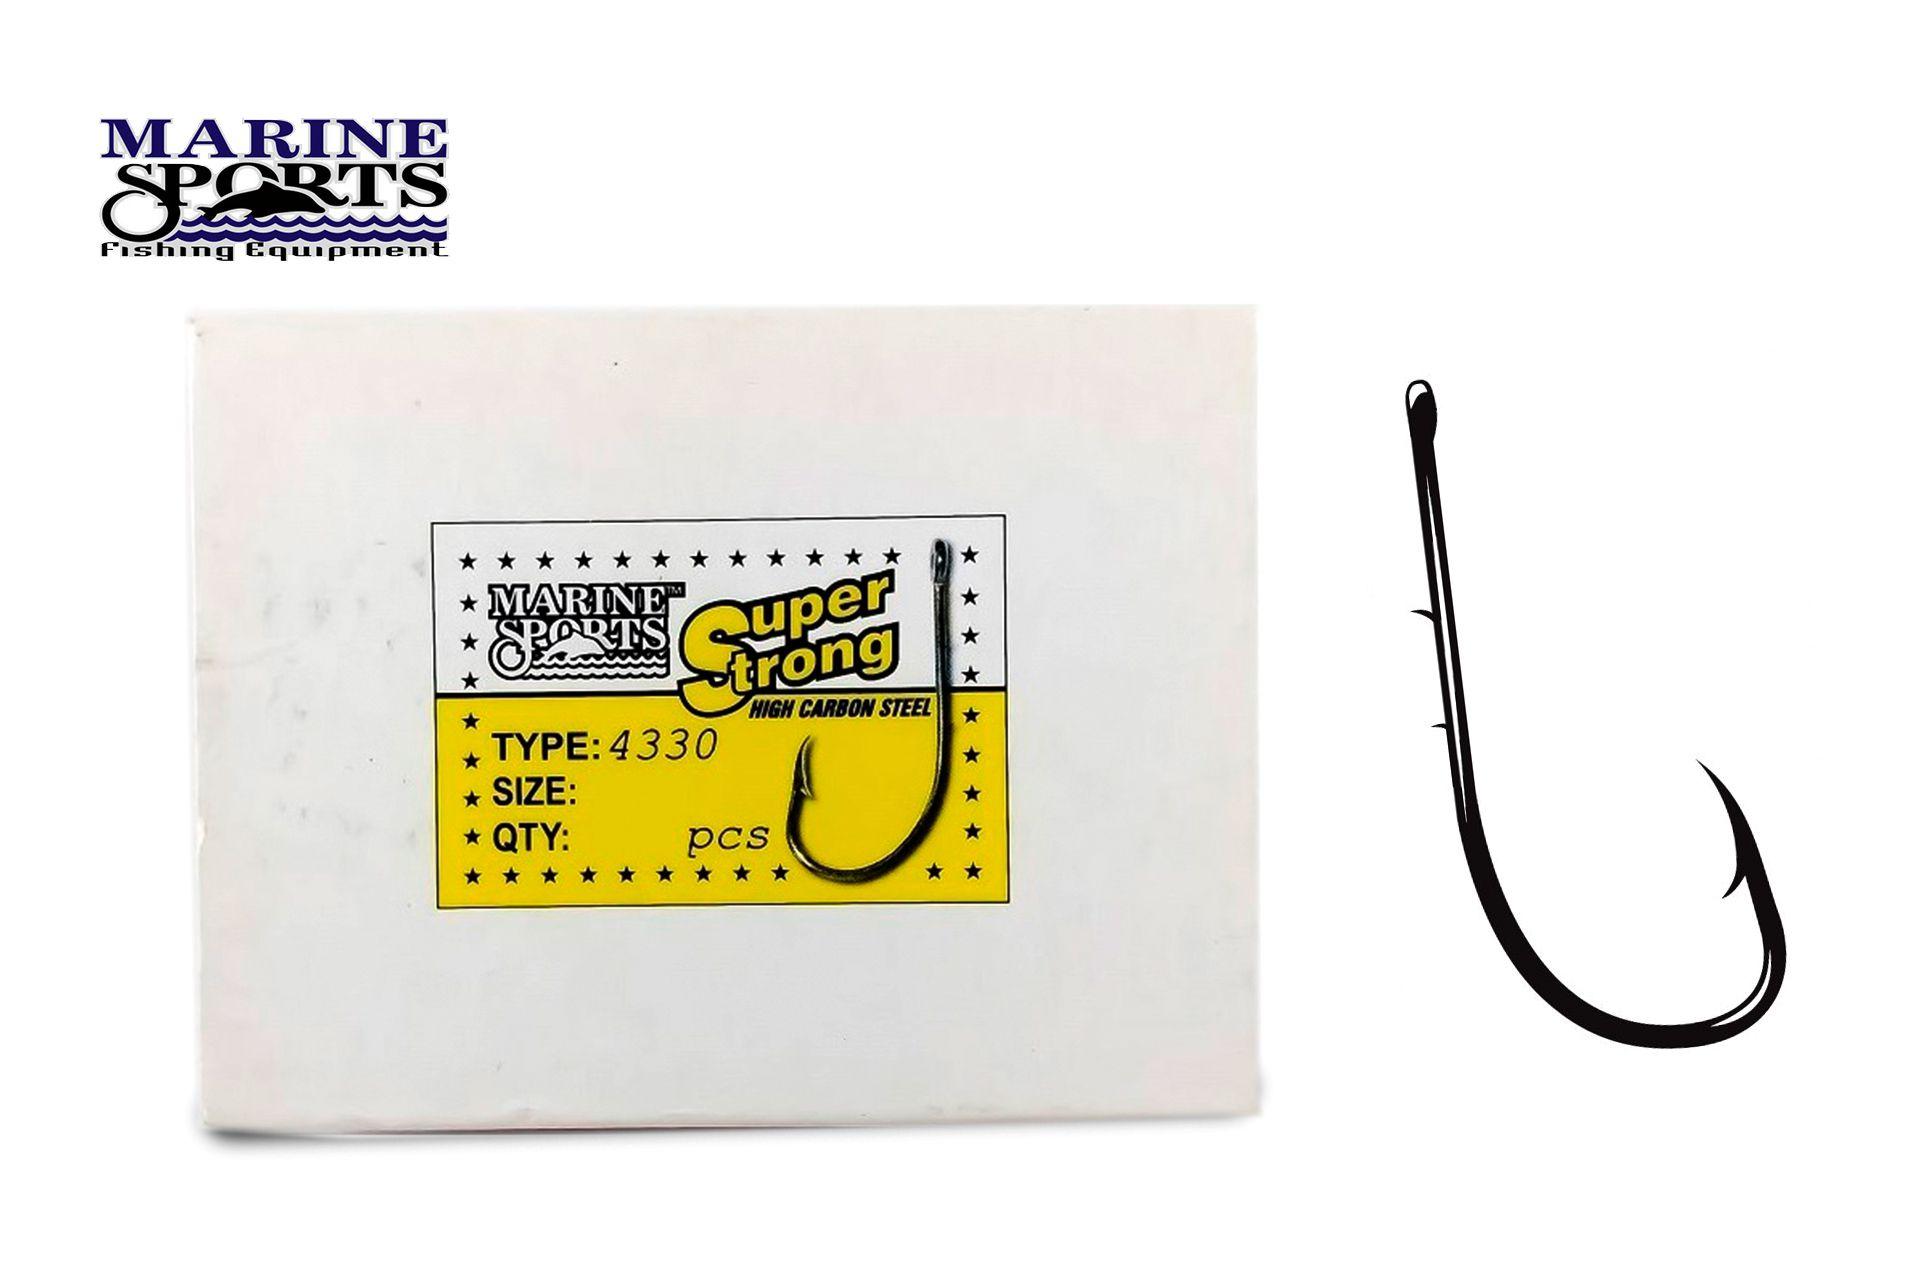 Anzol Marine Sports Super Strong 4330 N°16 (1,1cm) C/ Farpas - 100 Peças